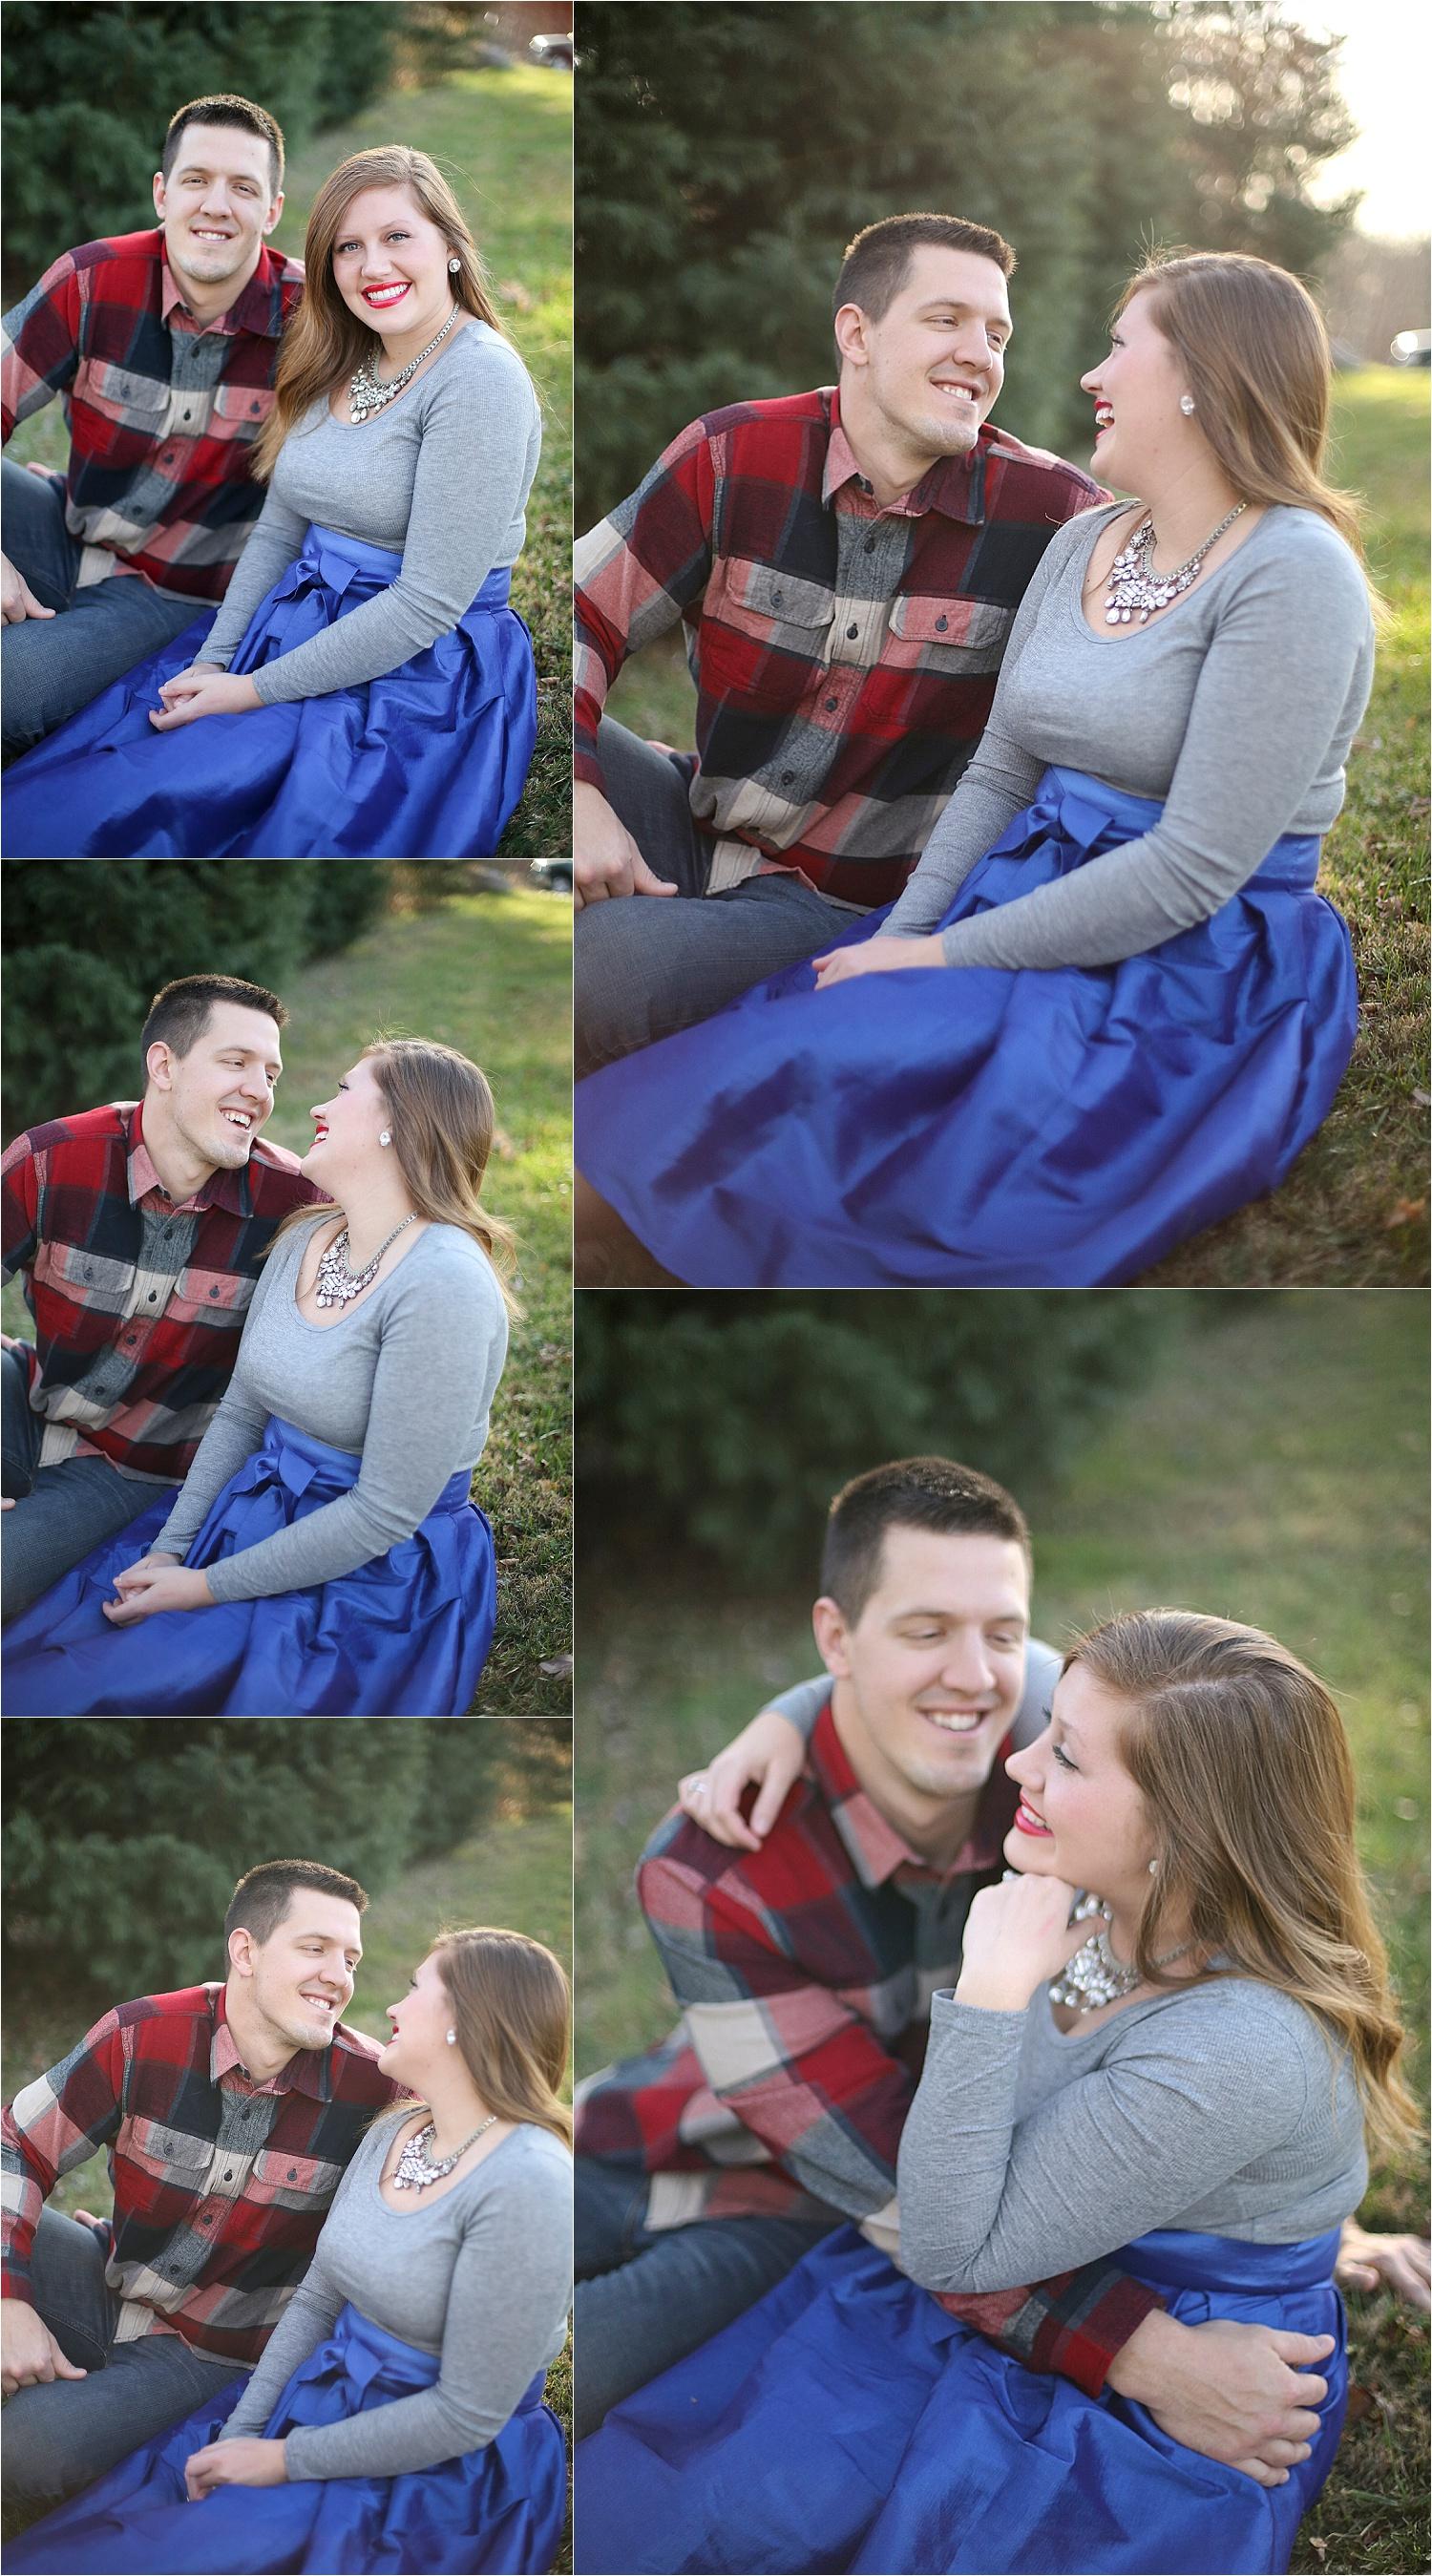 Danielle-Michael-Blacksburg-Christmas-Photos-_0004.jpg